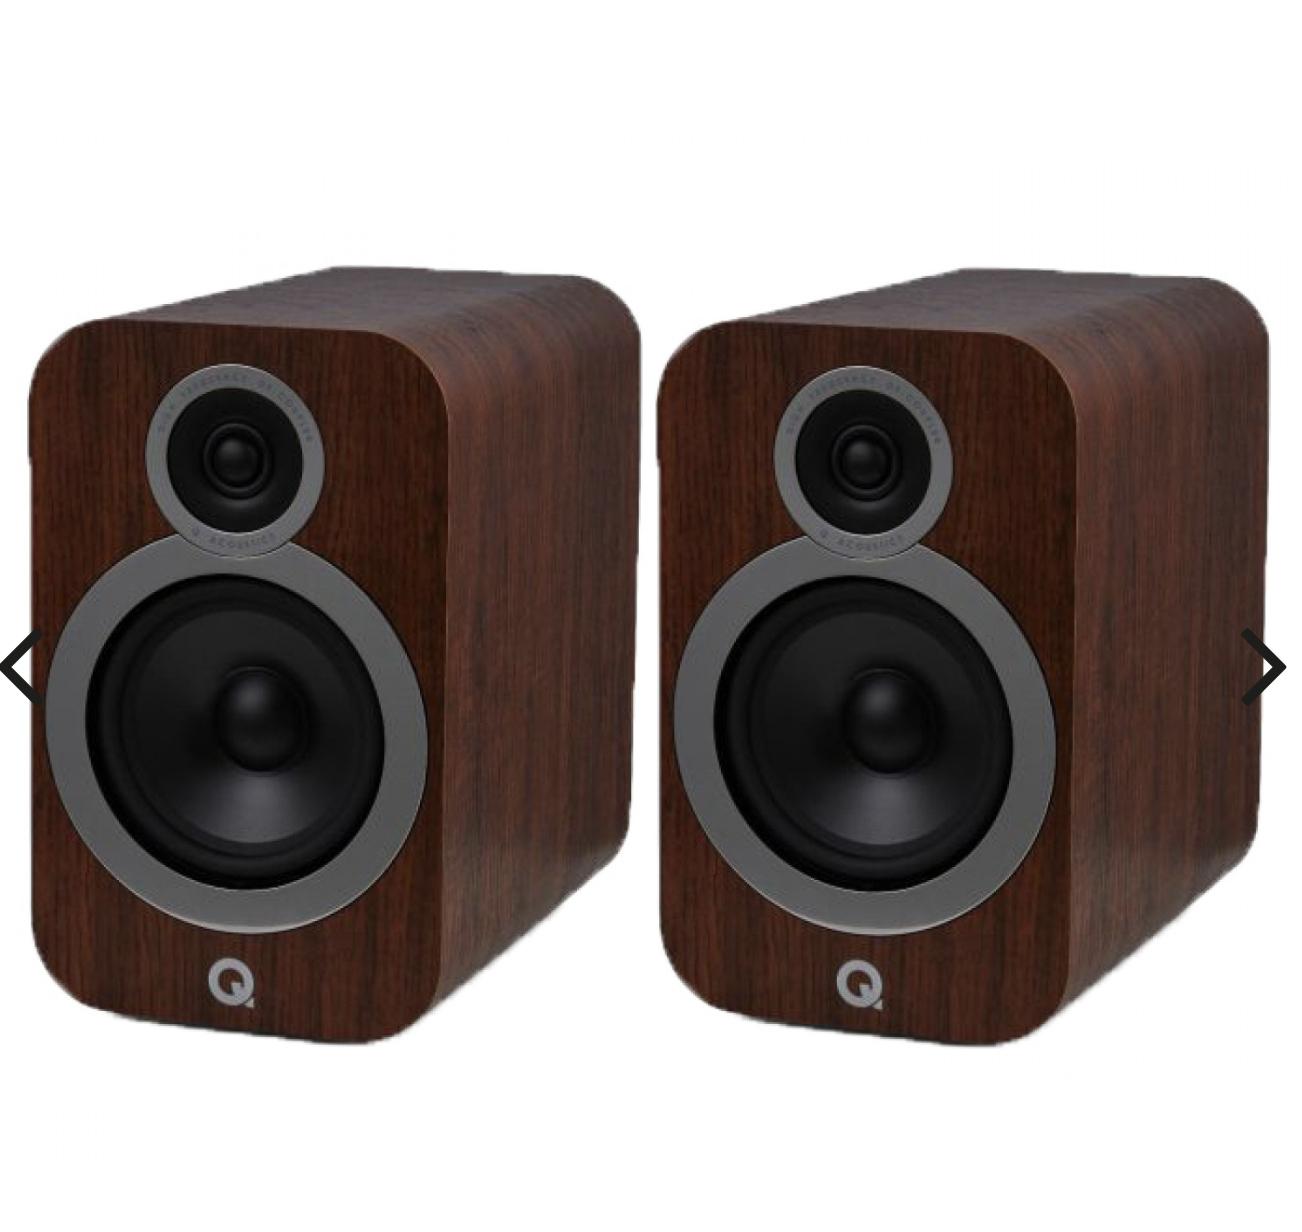 Q Acoustics 3030i Bookshelf Speakers - 5 year warranty £289.90 Peter Tyson Audio Visual